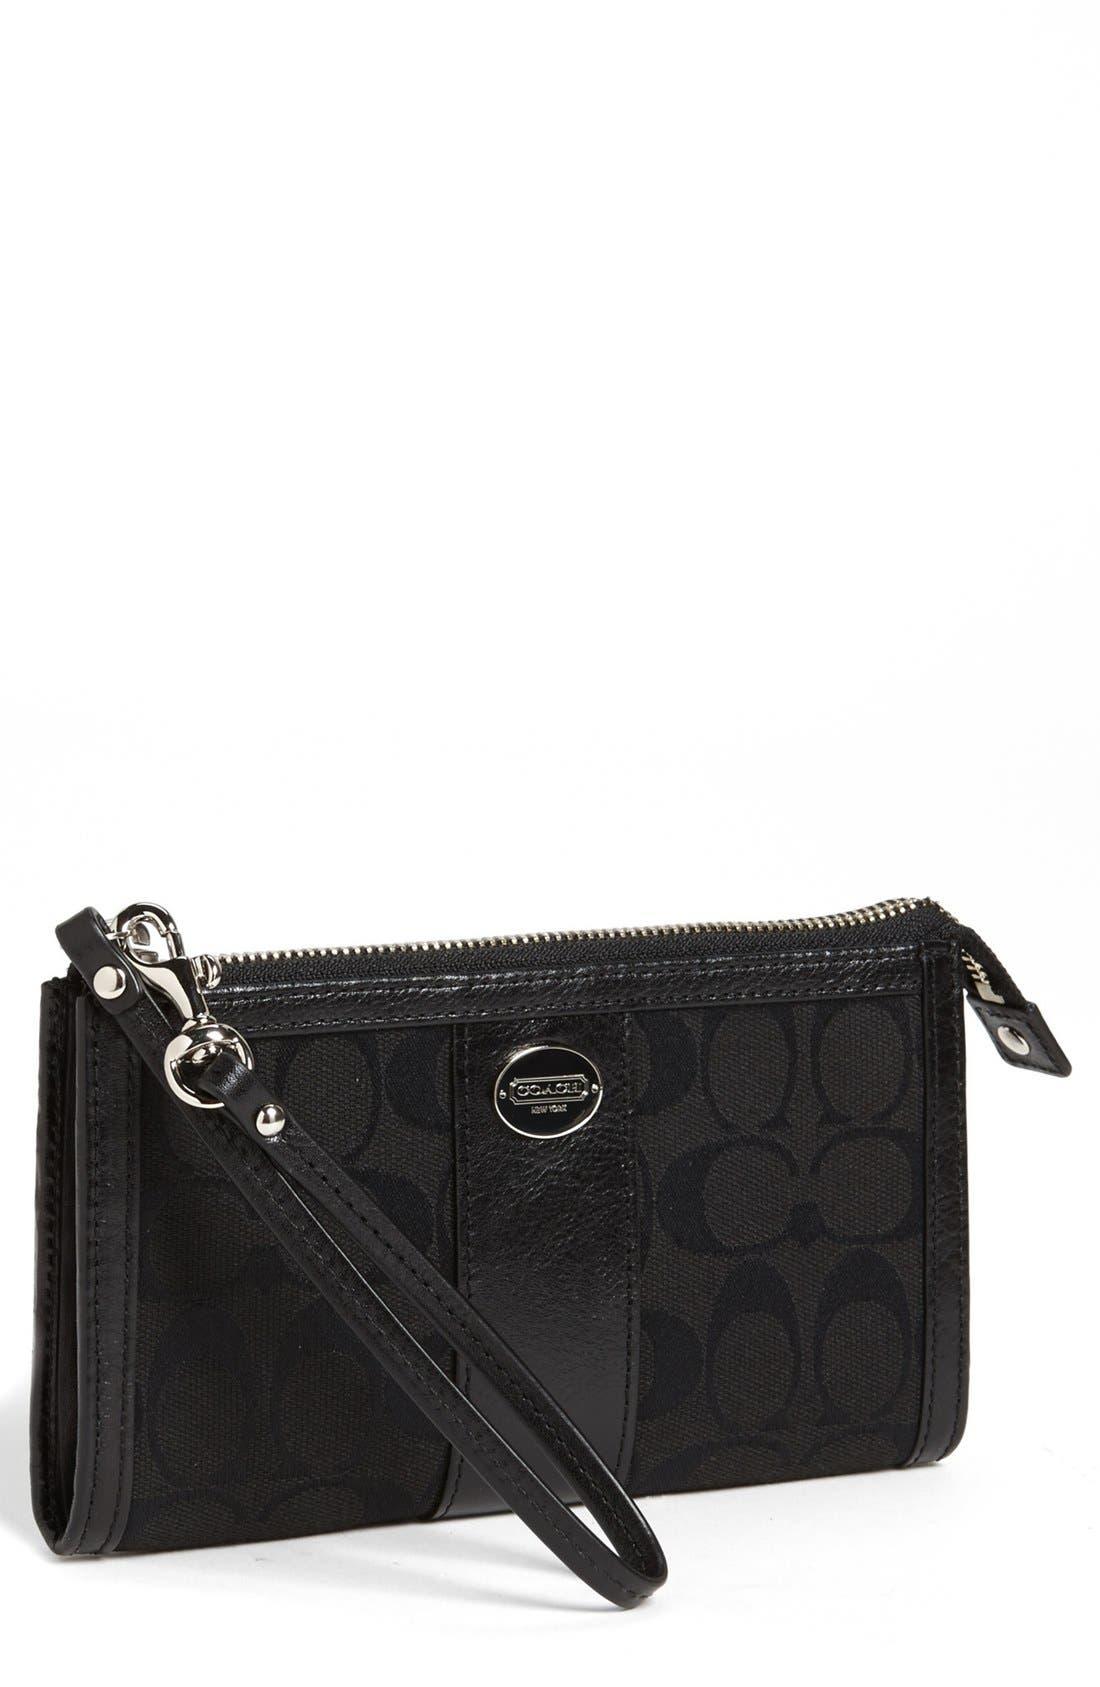 Main Image - COACH 'Signature - Zippy' Wallet